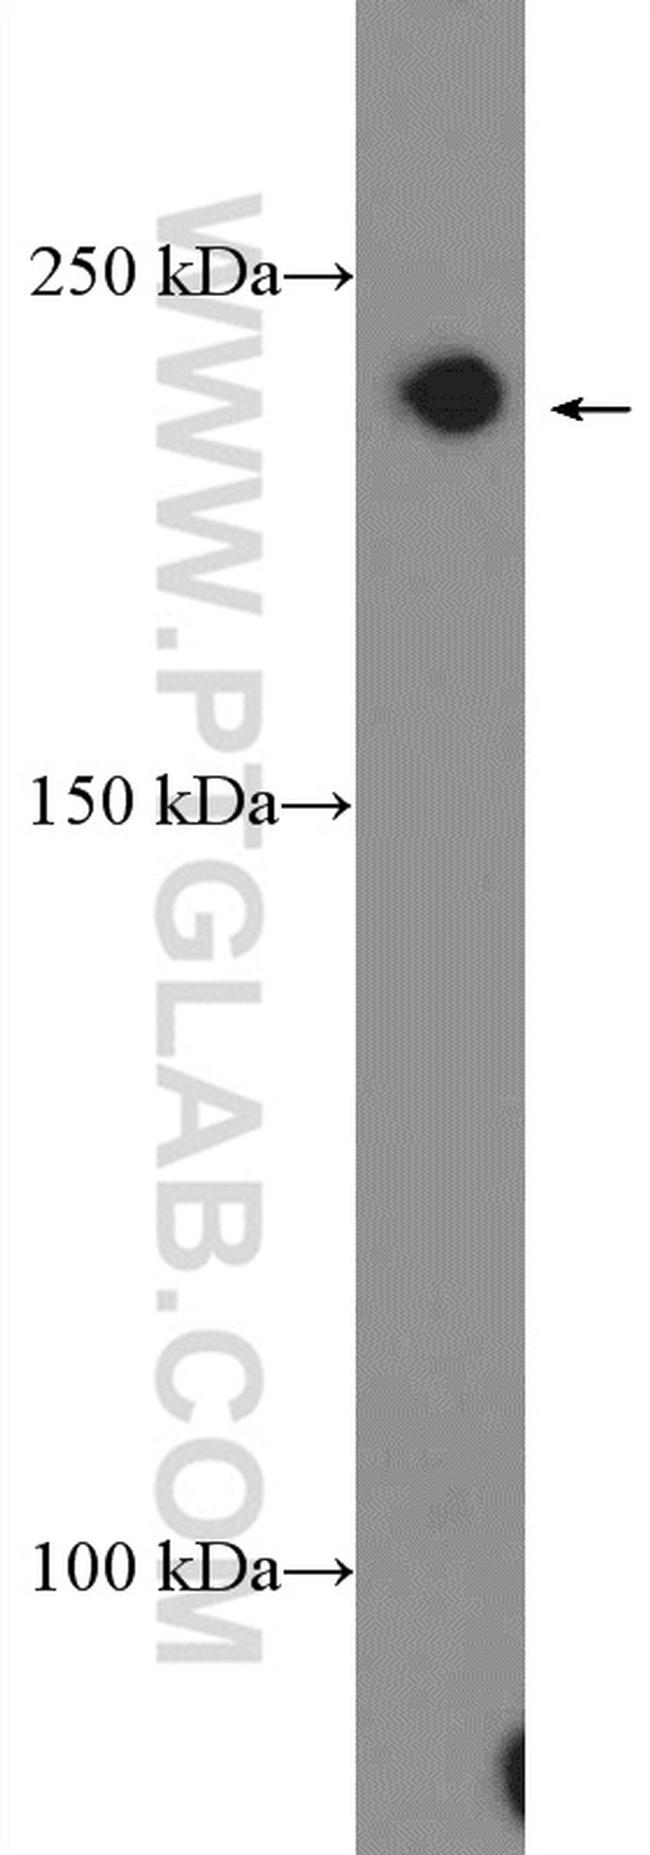 CACNA1D Antibody in Western Blot (WB)